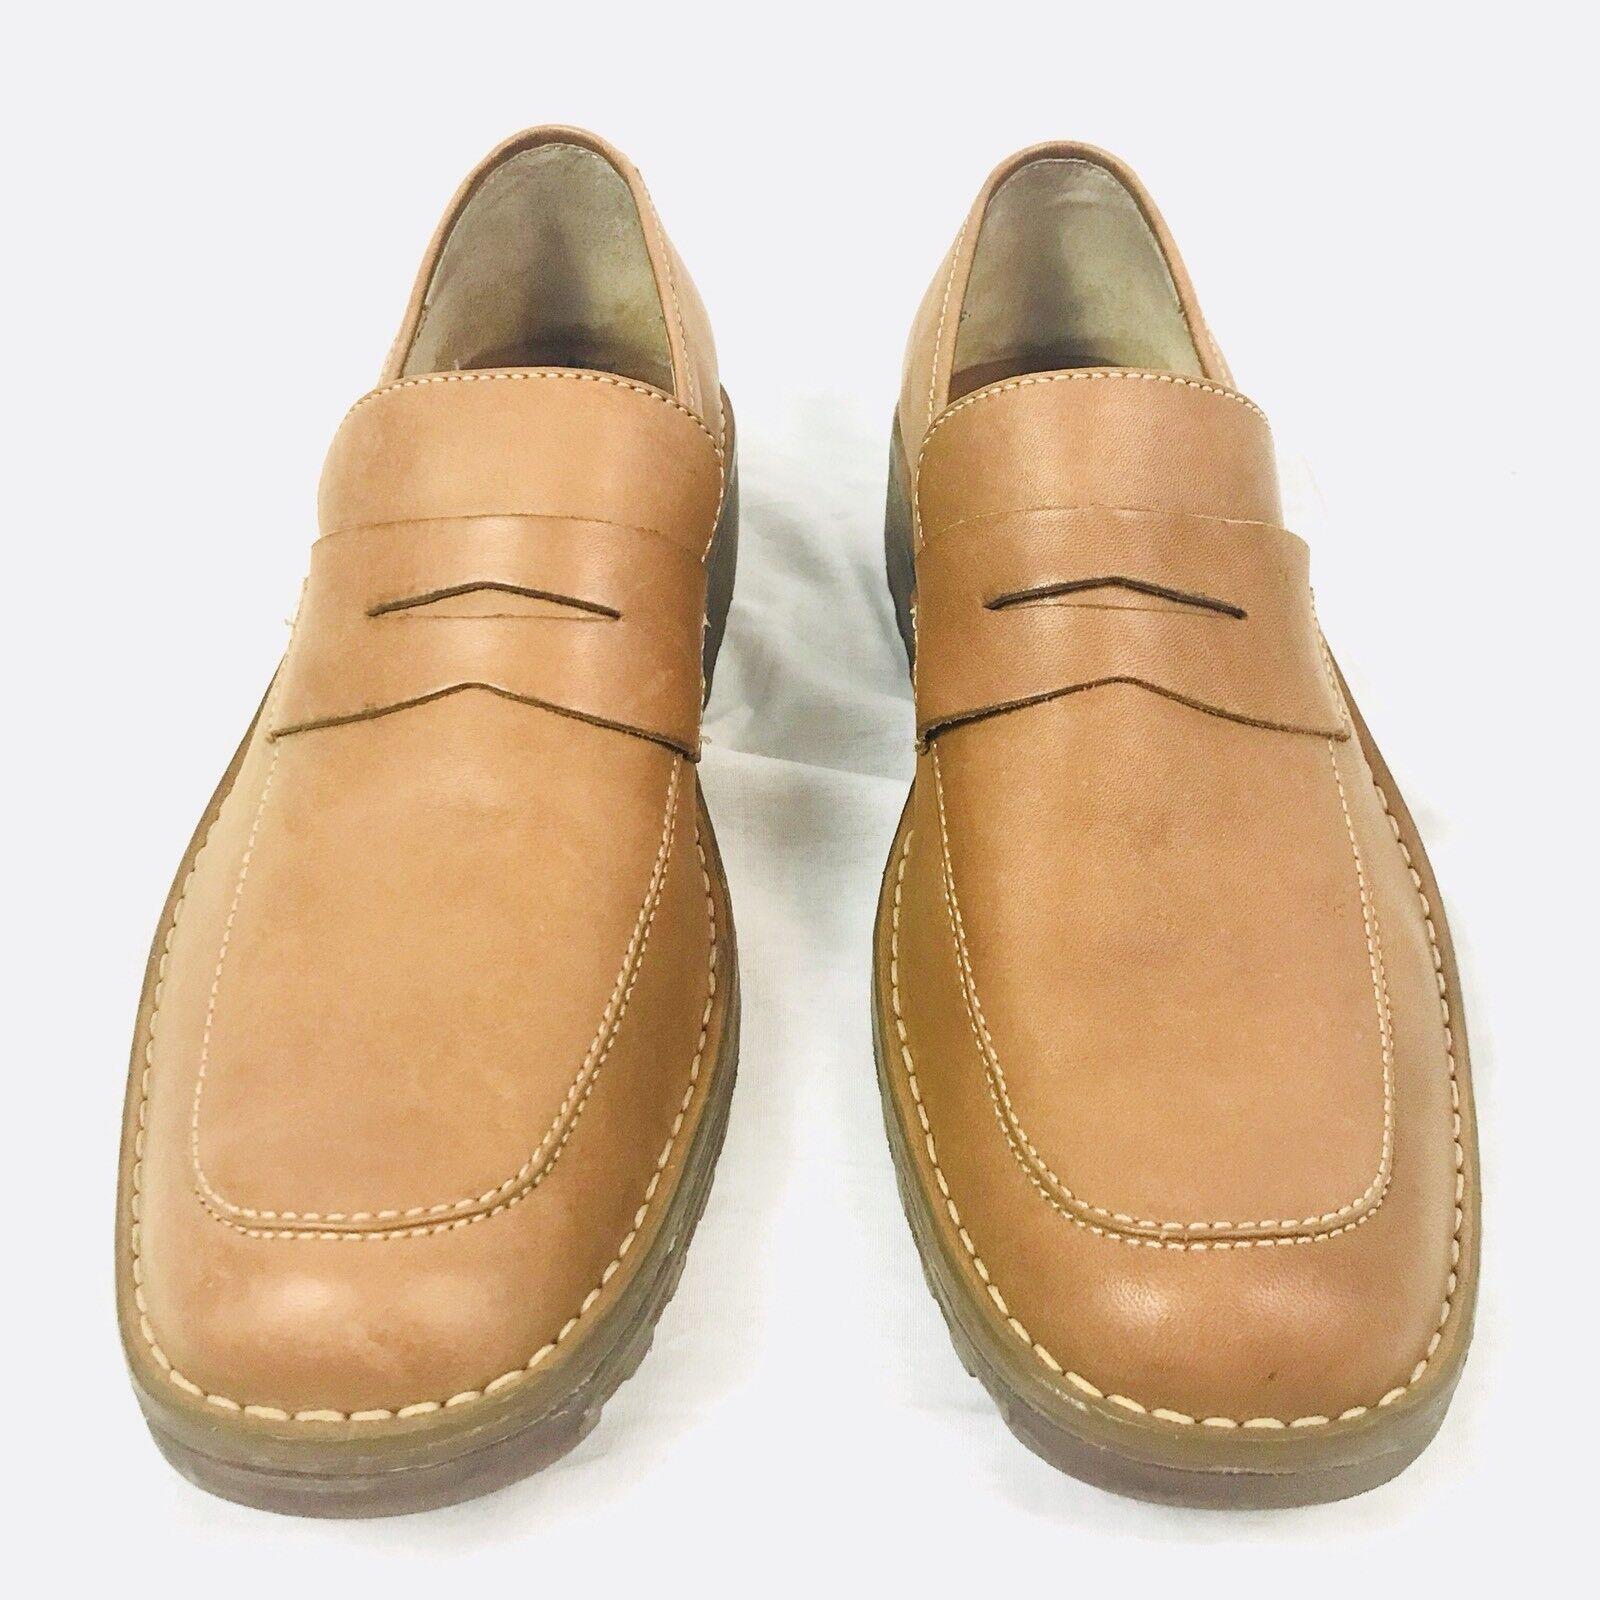 Born Pelle Loafers Slip On 10.5 5139